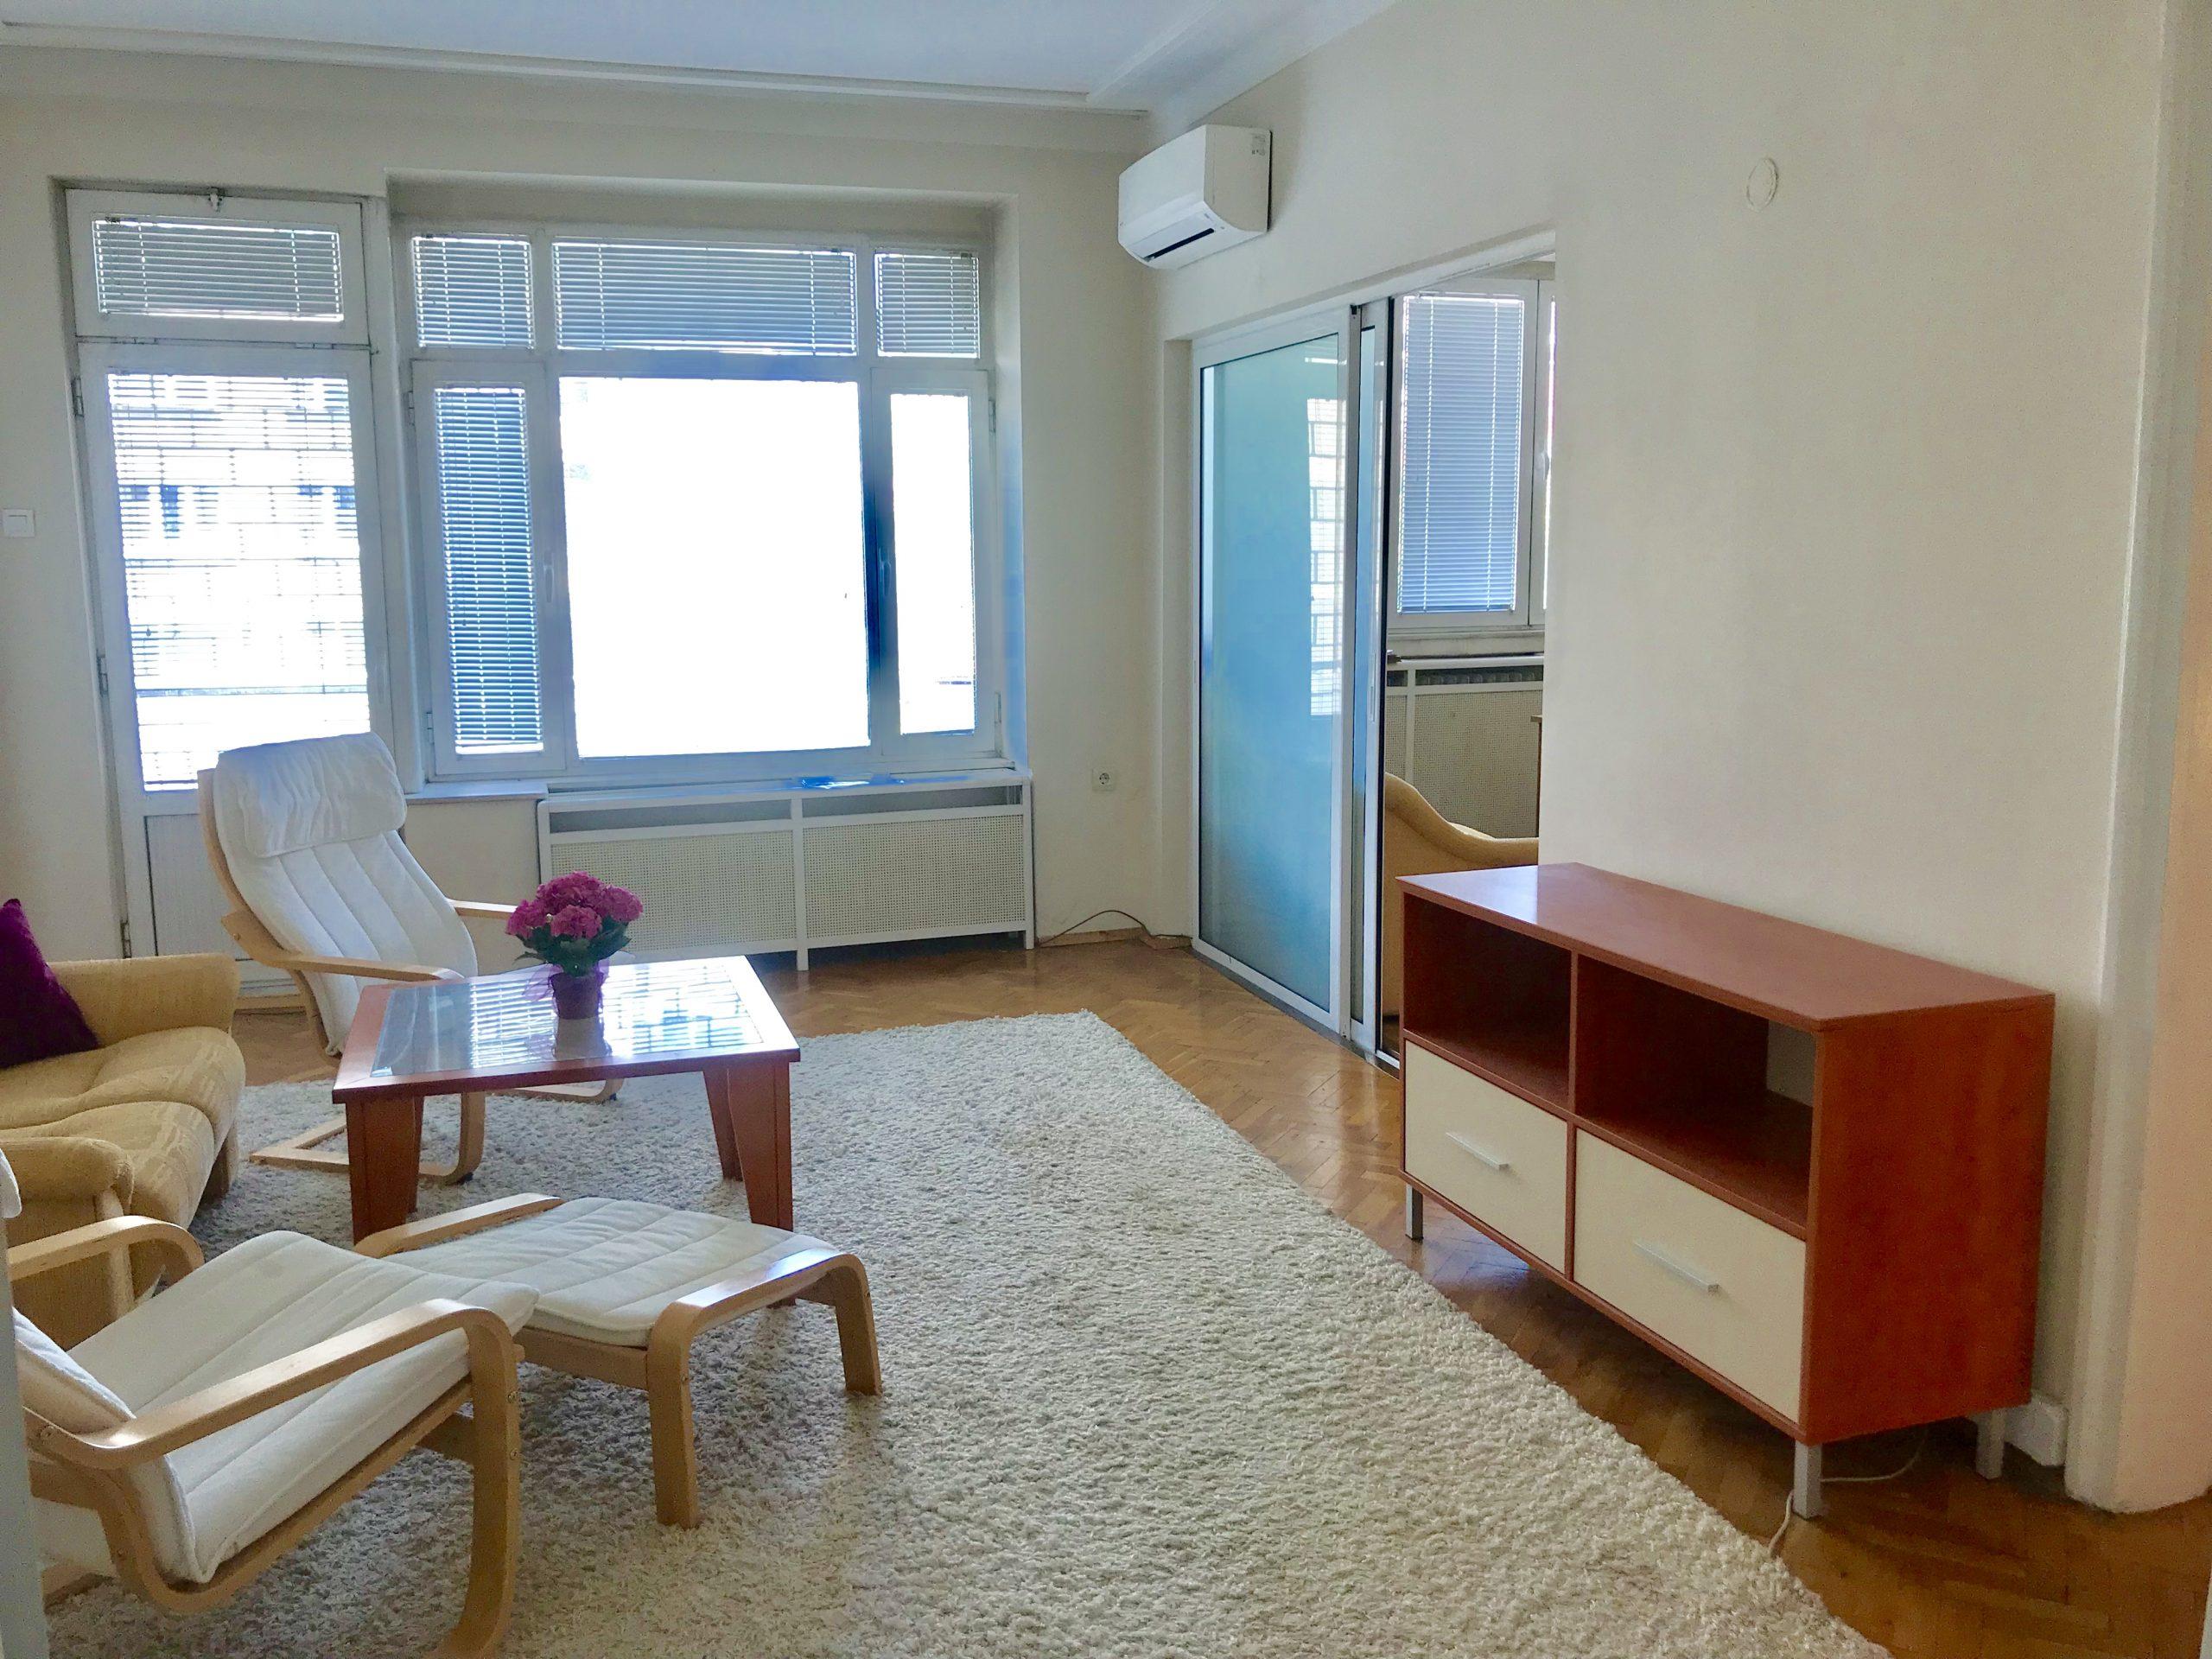 Тристаен апартамент под наем до Парк Заимов, гр. София